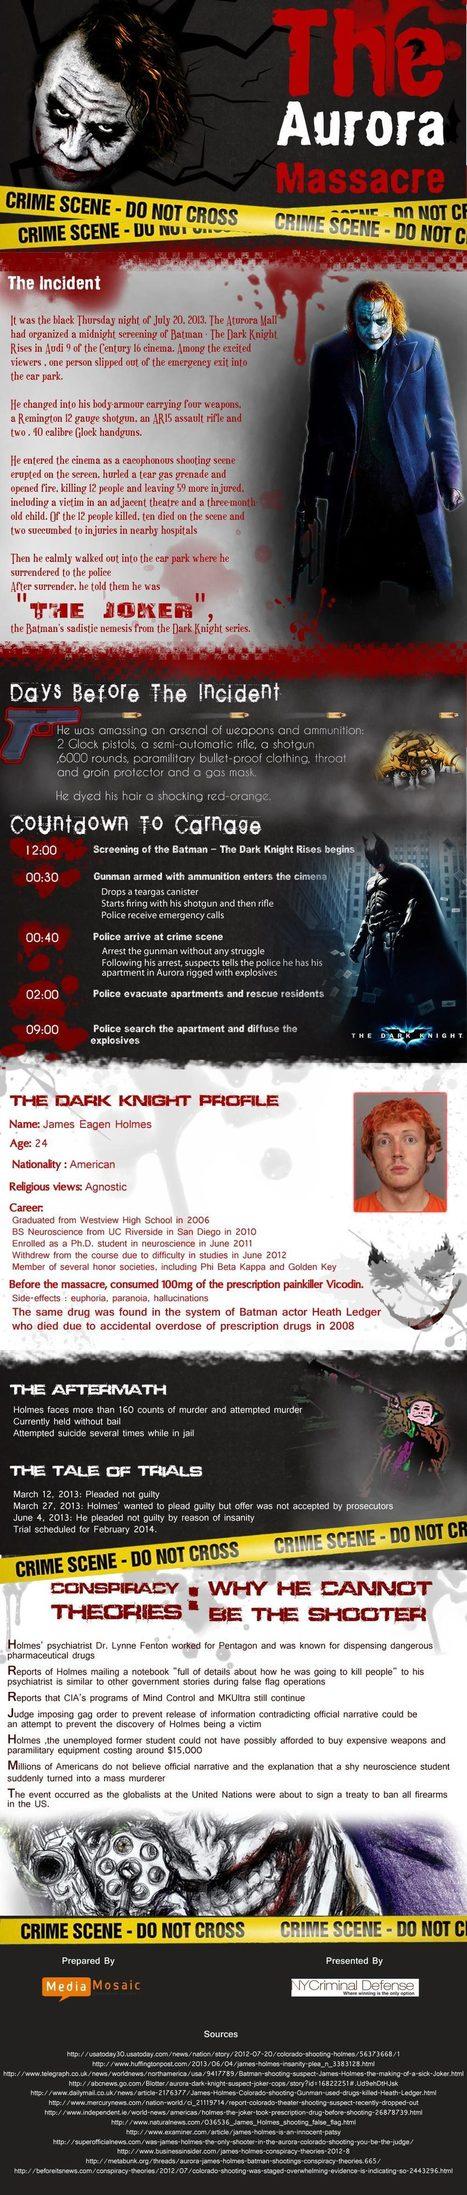 The Joker-Massacre in Aurora (Infographic) | Infographic List | Scoop.it